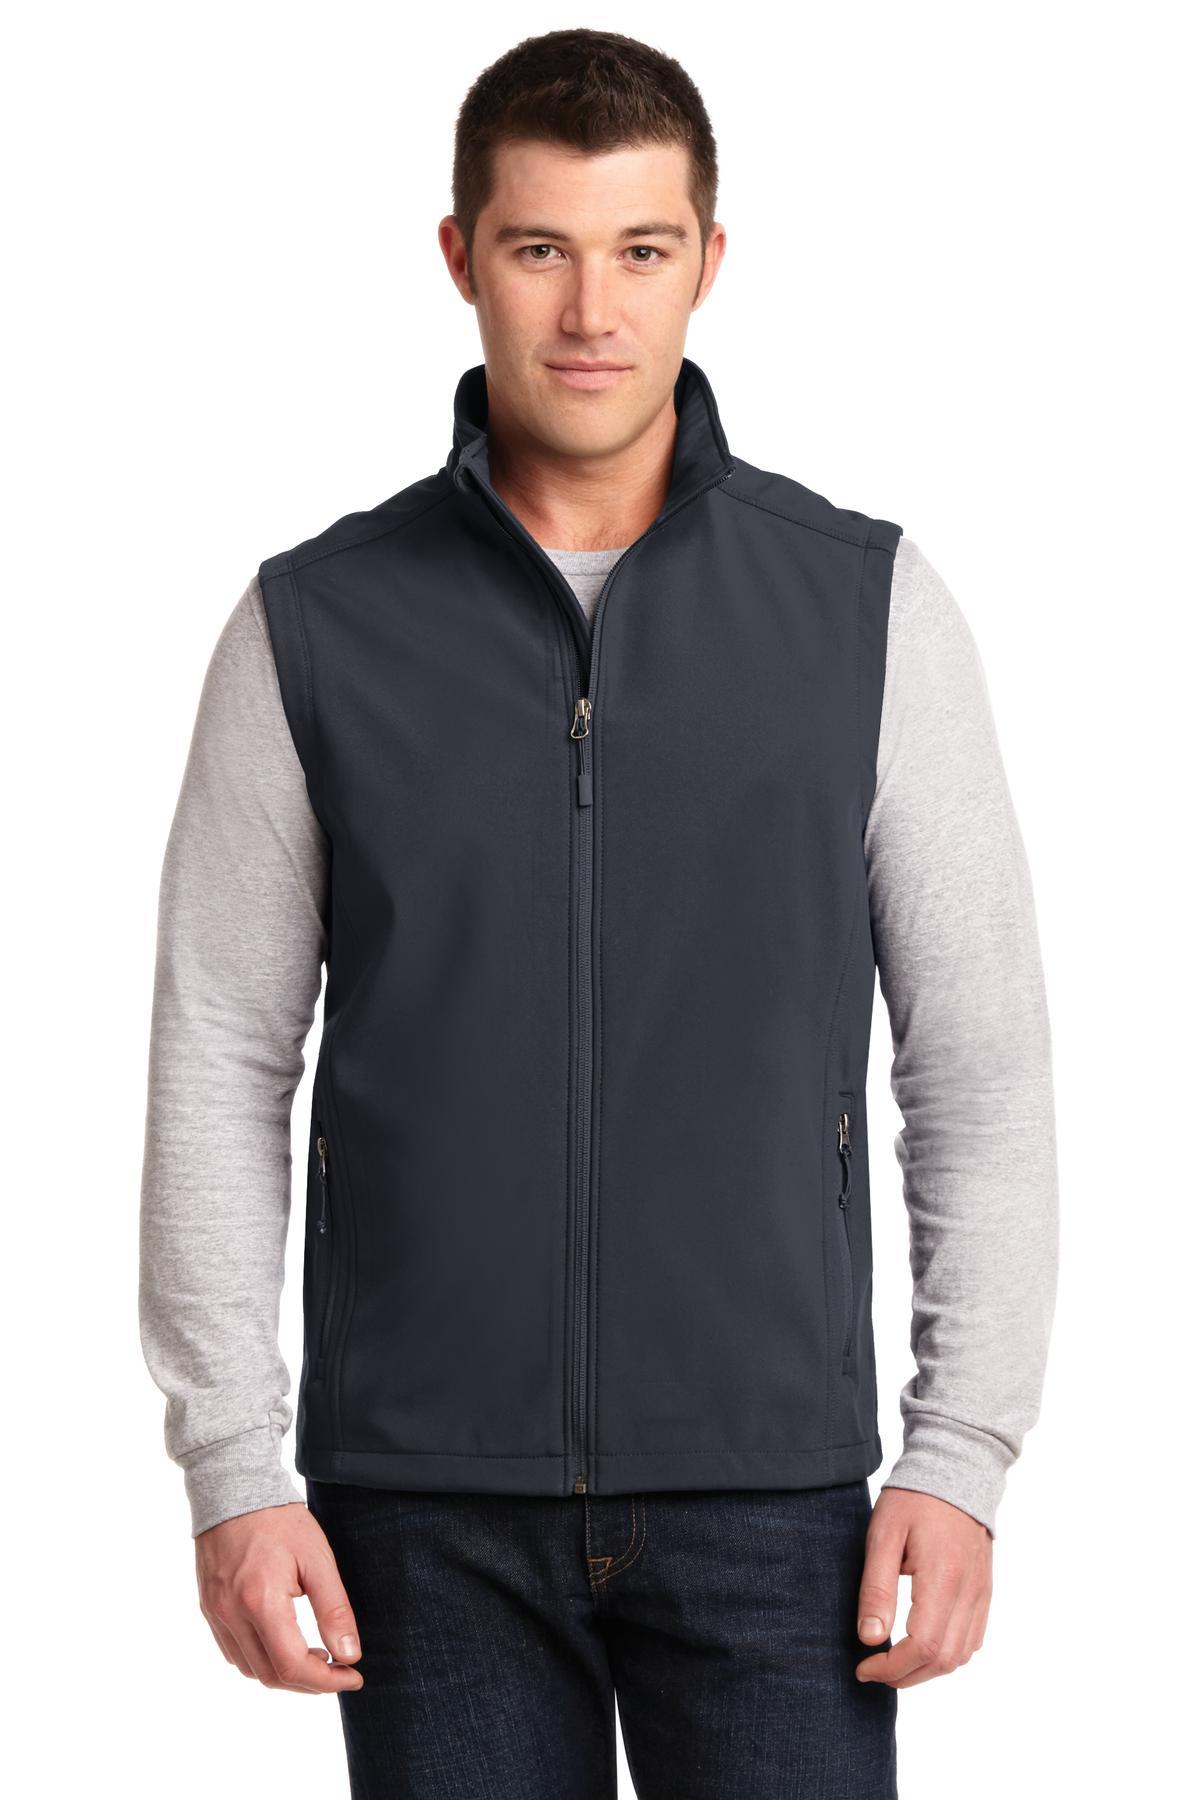 Port Authority® Core Soft Shell Vest.-Port Authority